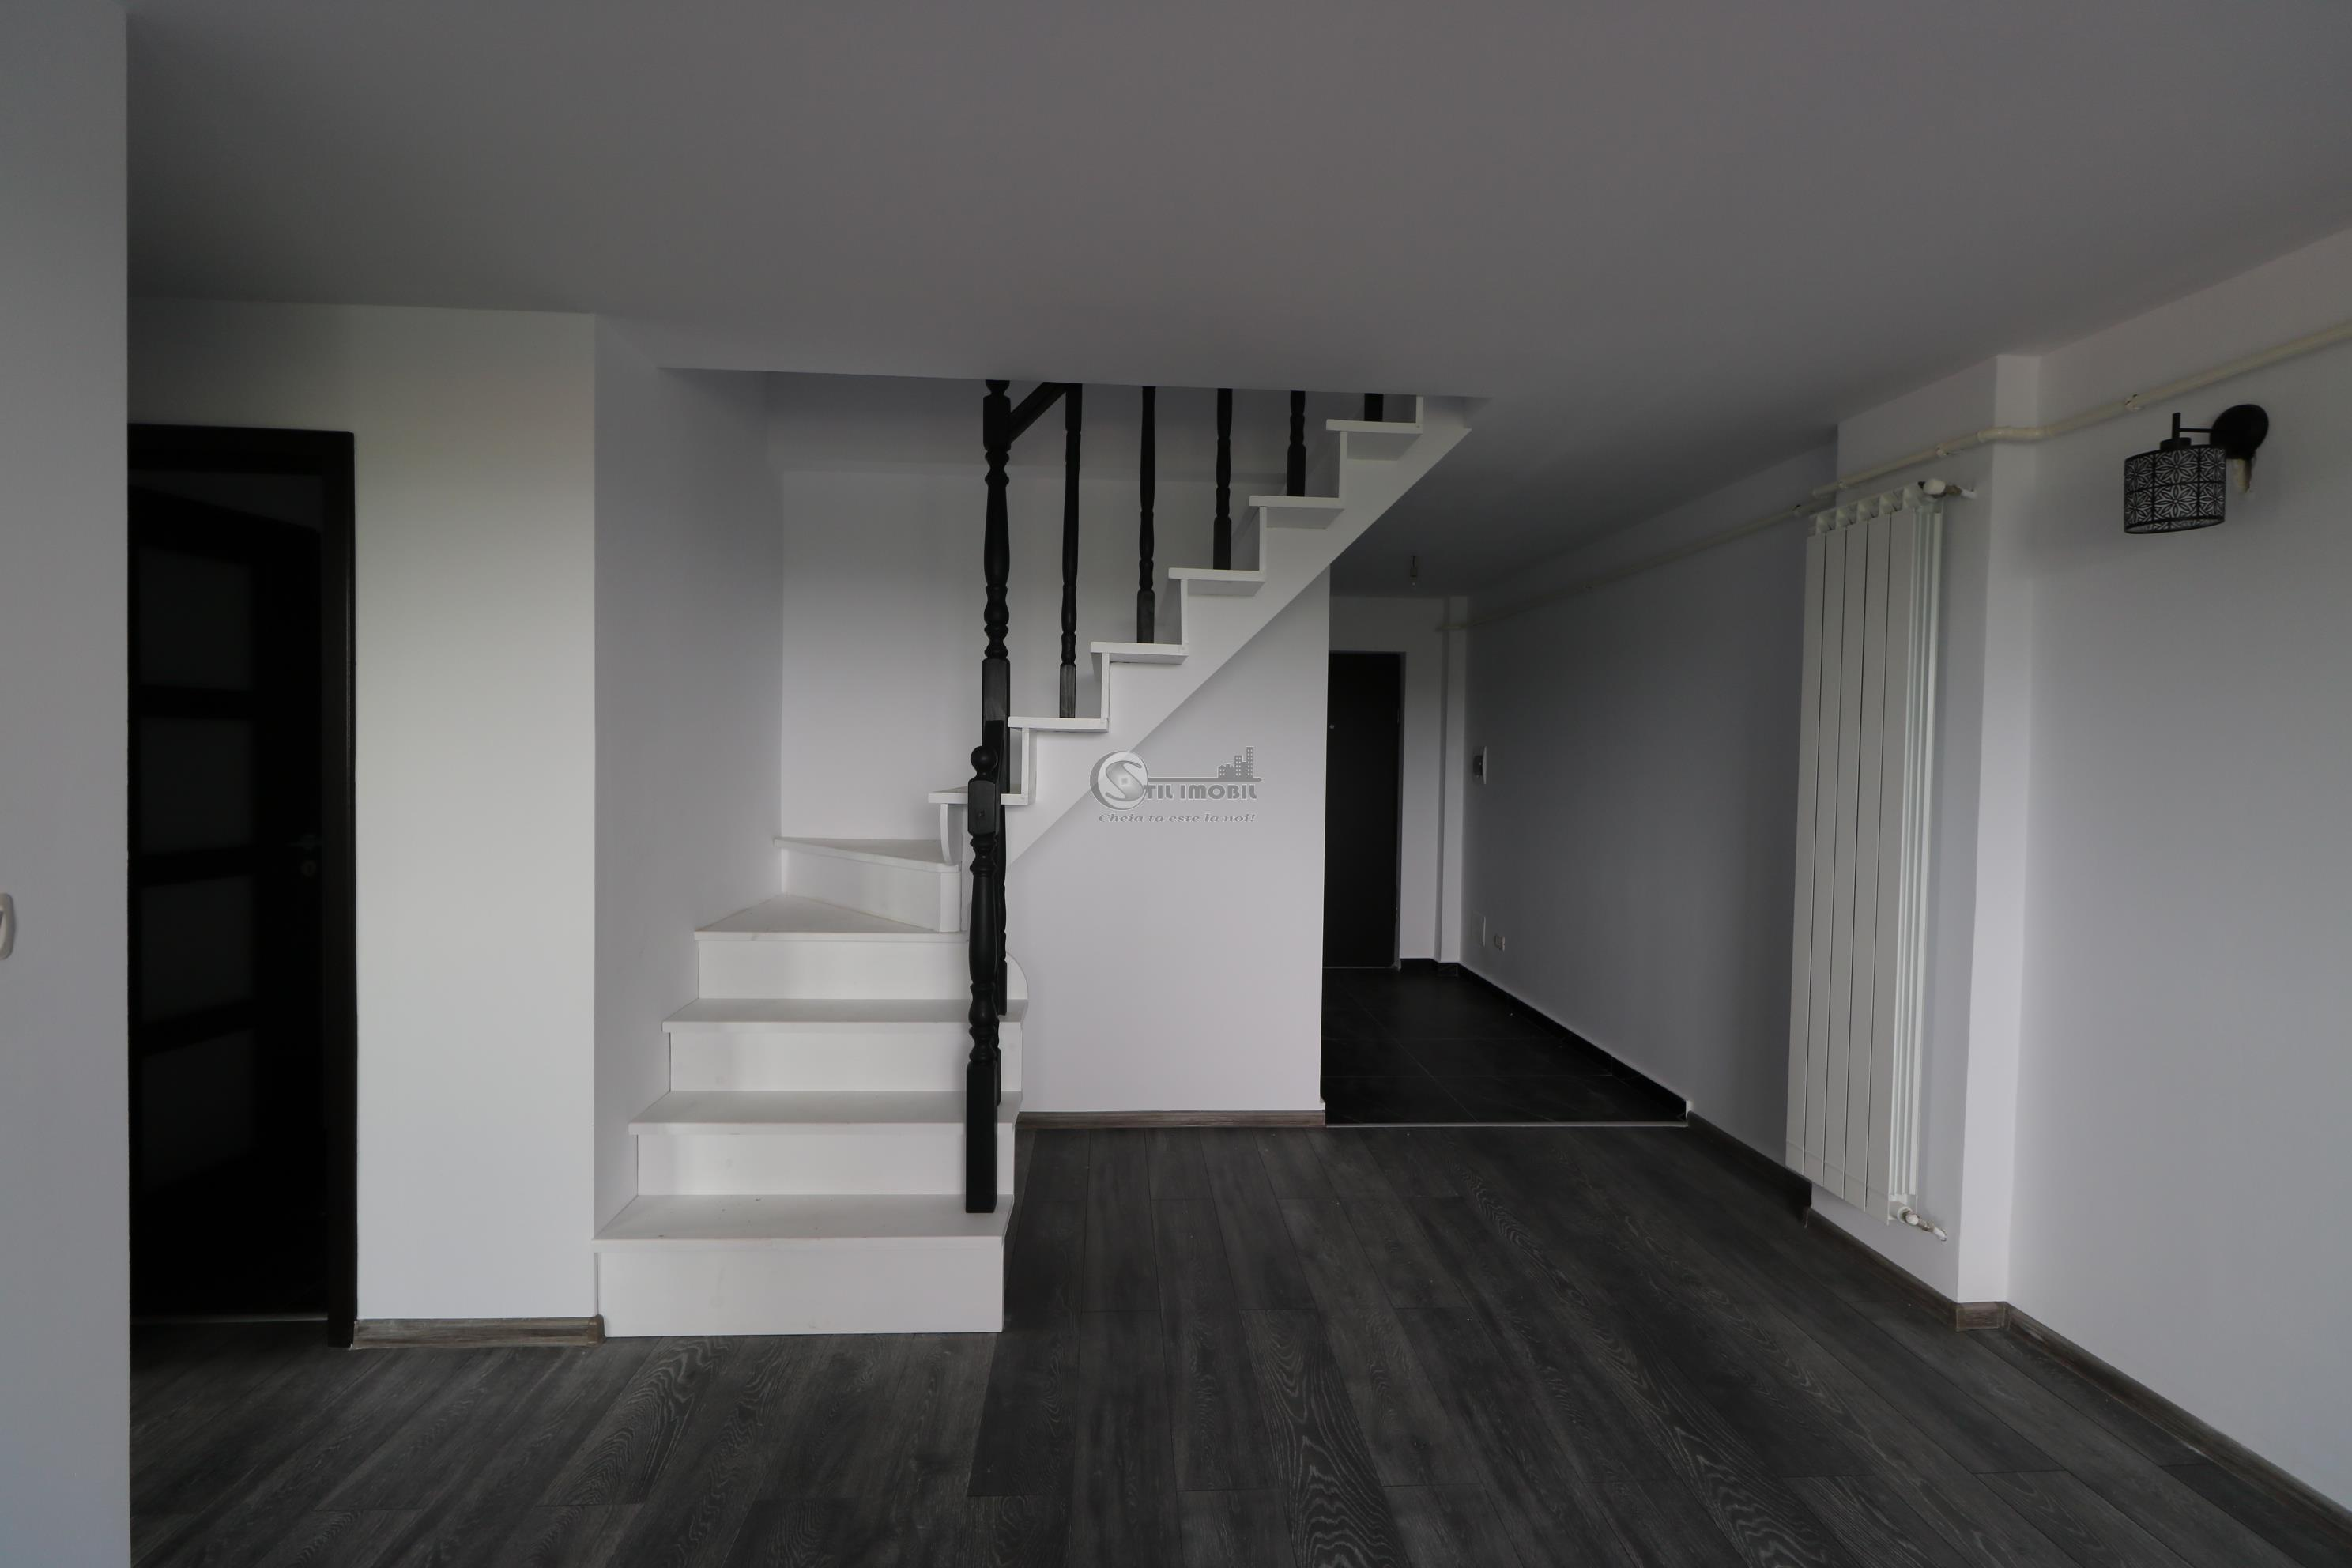 Liber ap 3-4 camere , scara interioara,75mp CUG,nou